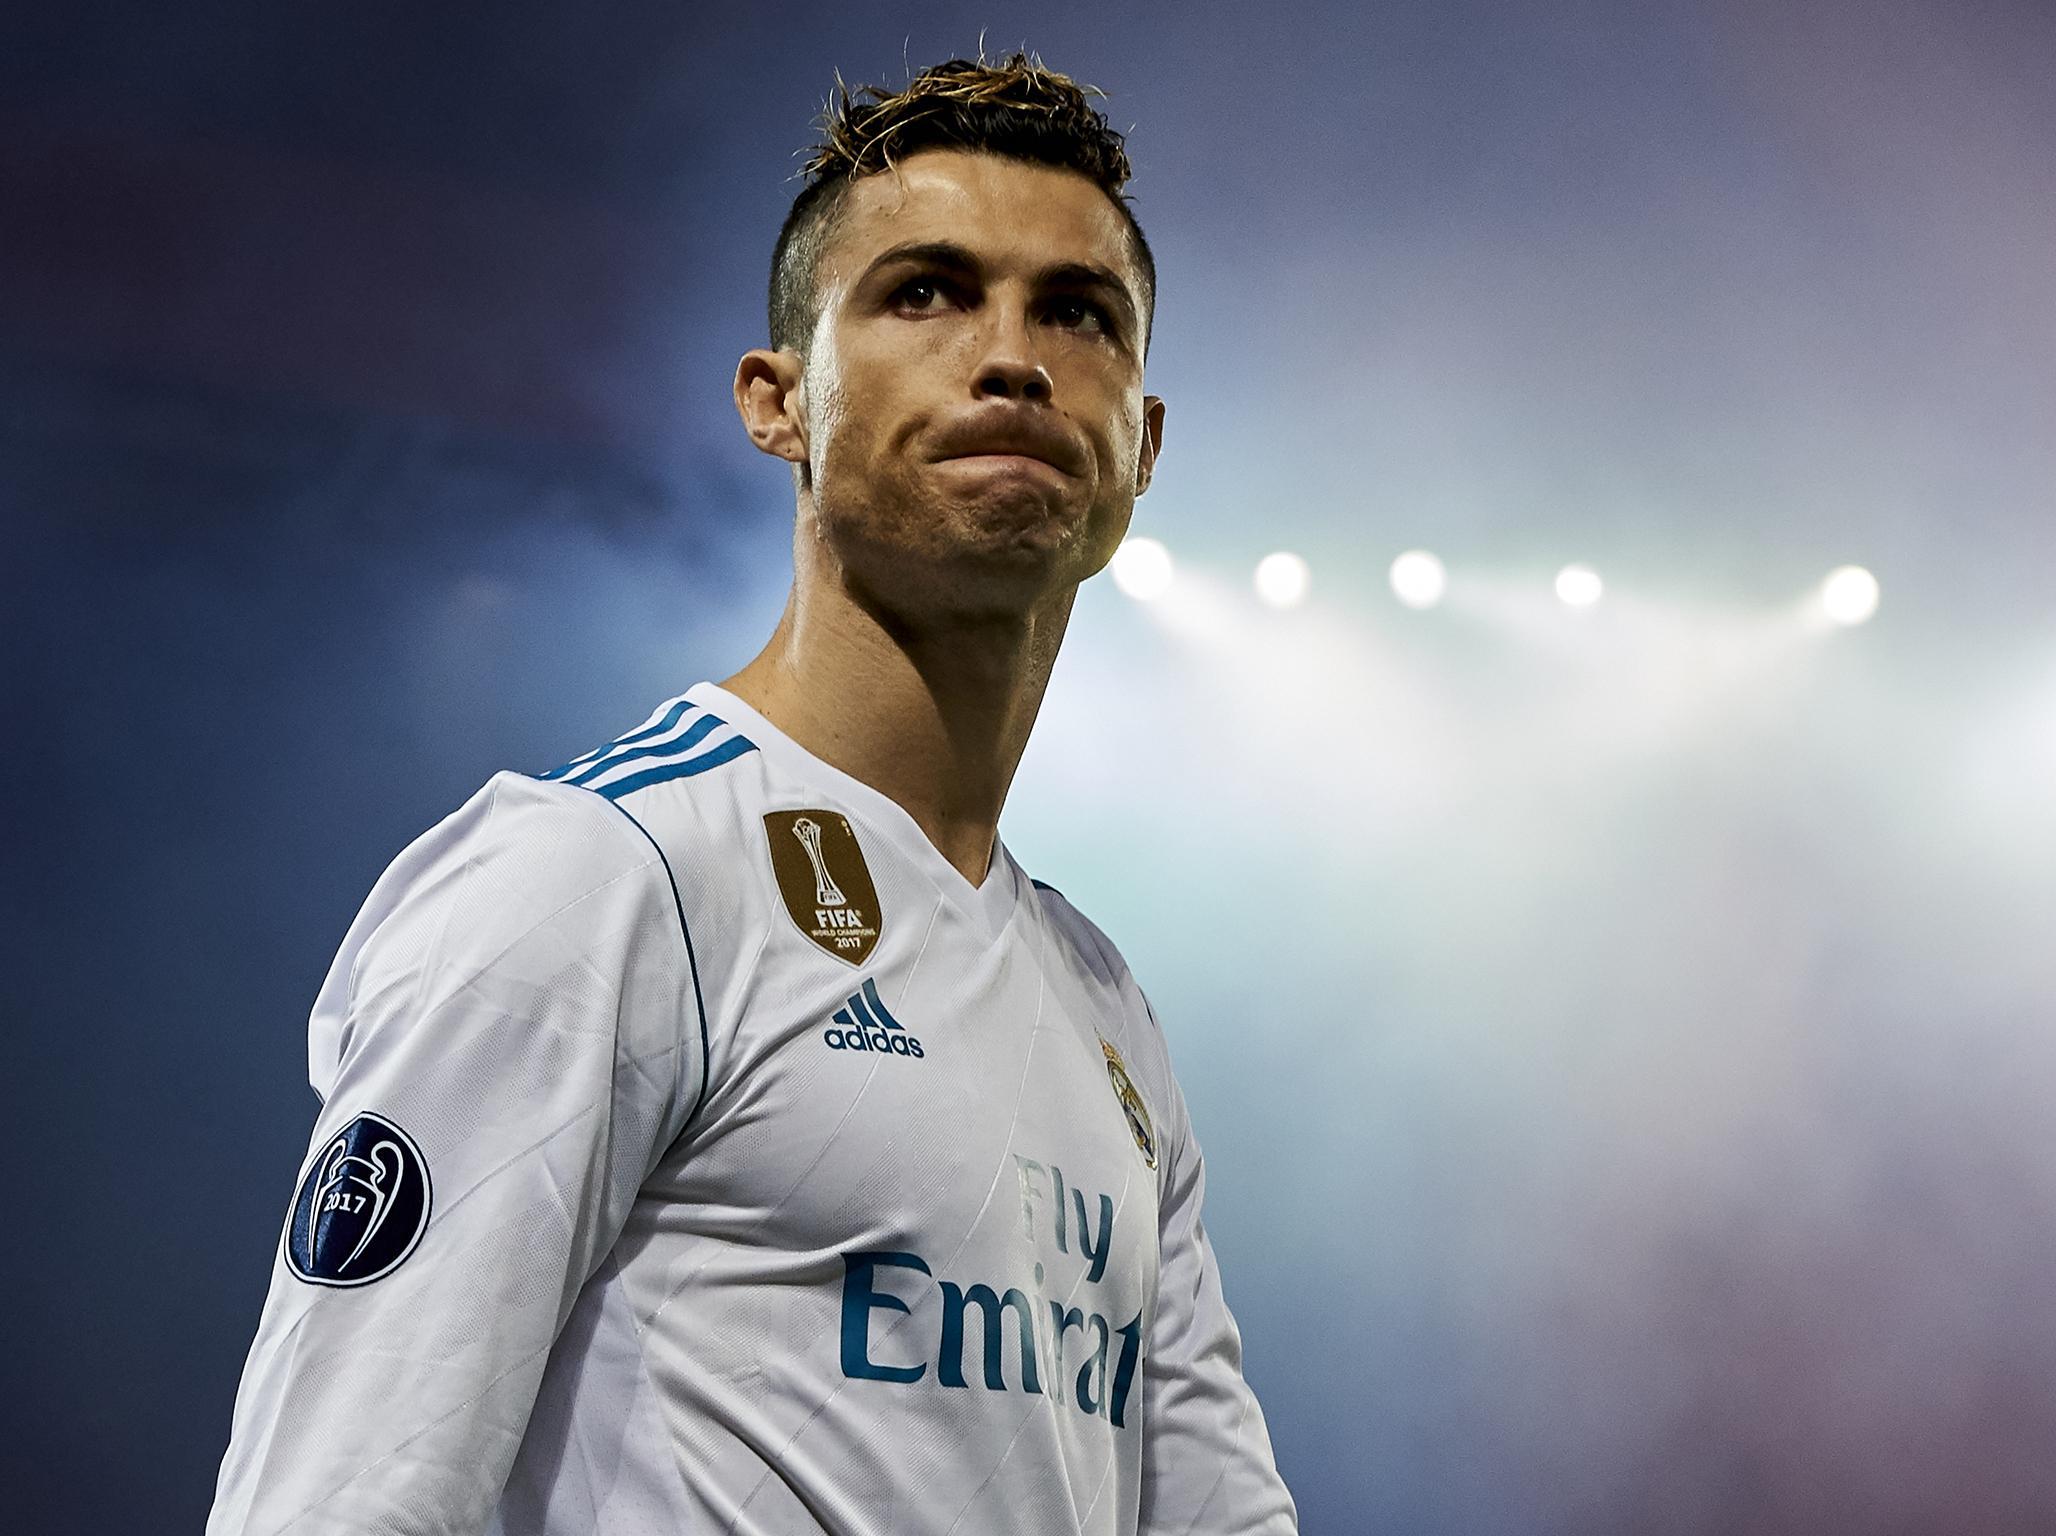 Cristiano Ronaldo's finest European performances